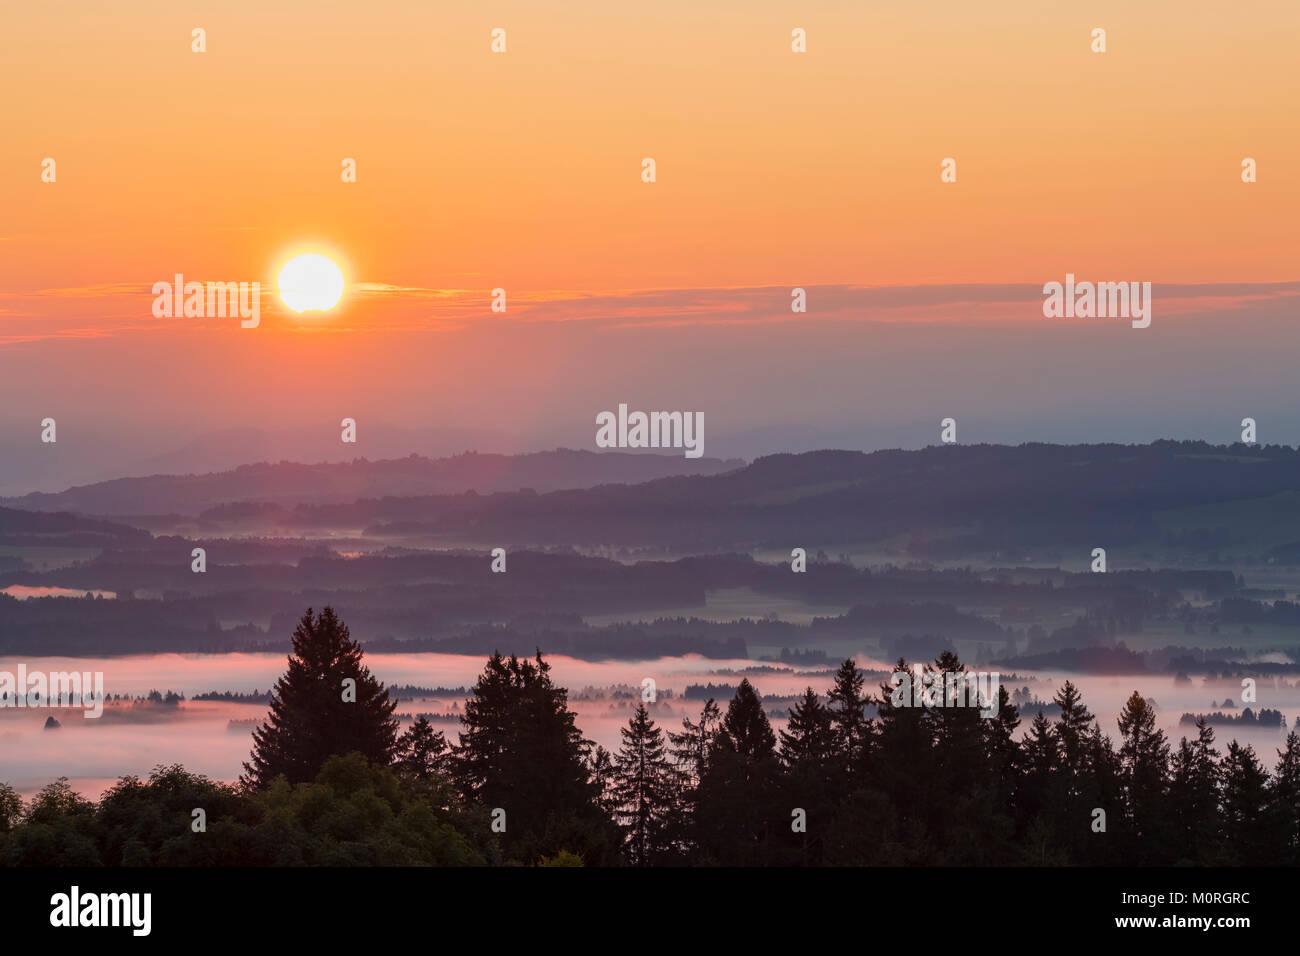 Sonnenaufgang, Nebel über dem Lechtal, Ausblick vom Auerberg bei Bernbeuren, Pfaffenwinkel, Oberbayern, Bayern, - Stock Image